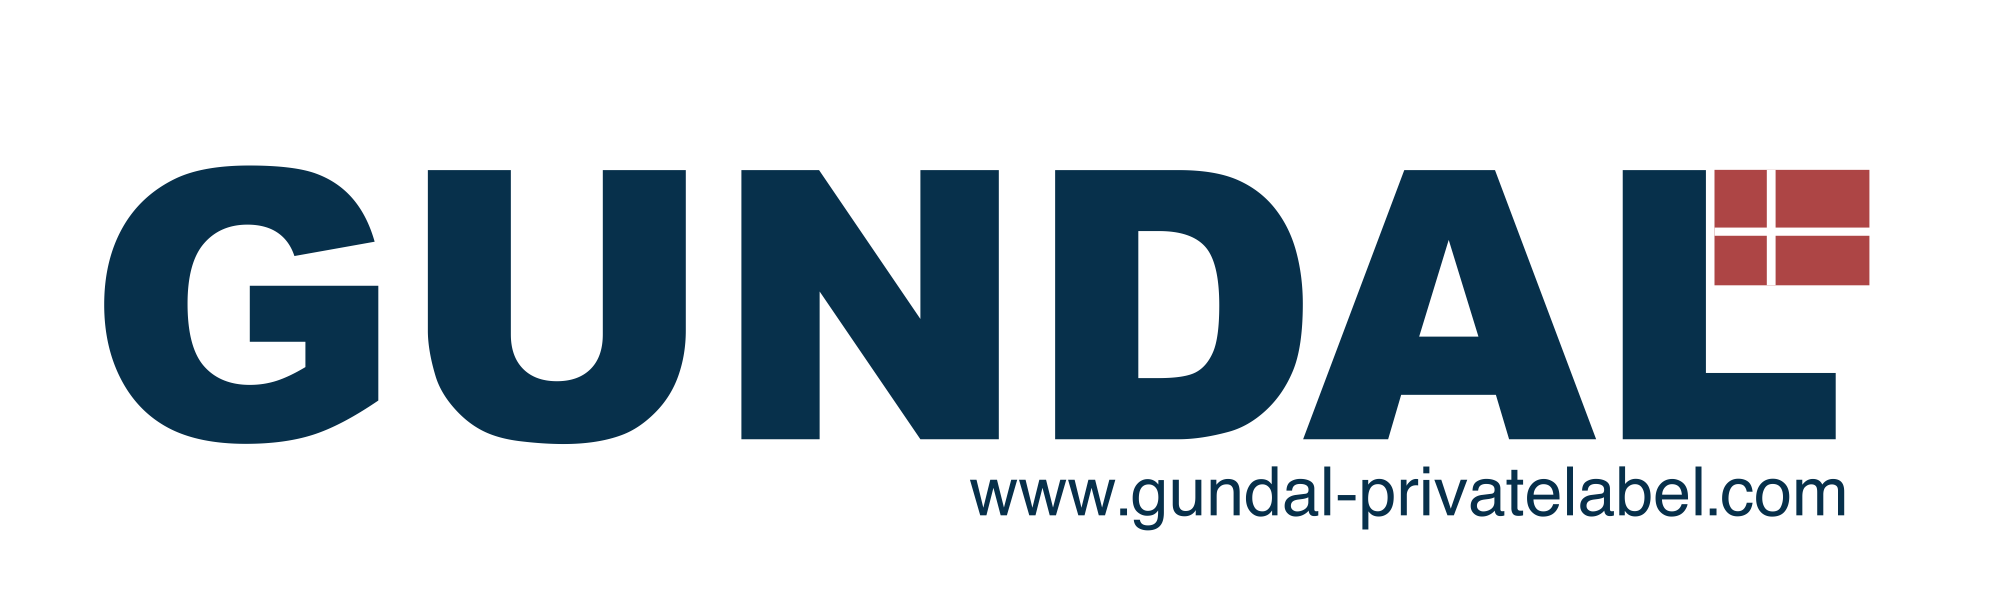 GUNDAL Privat label